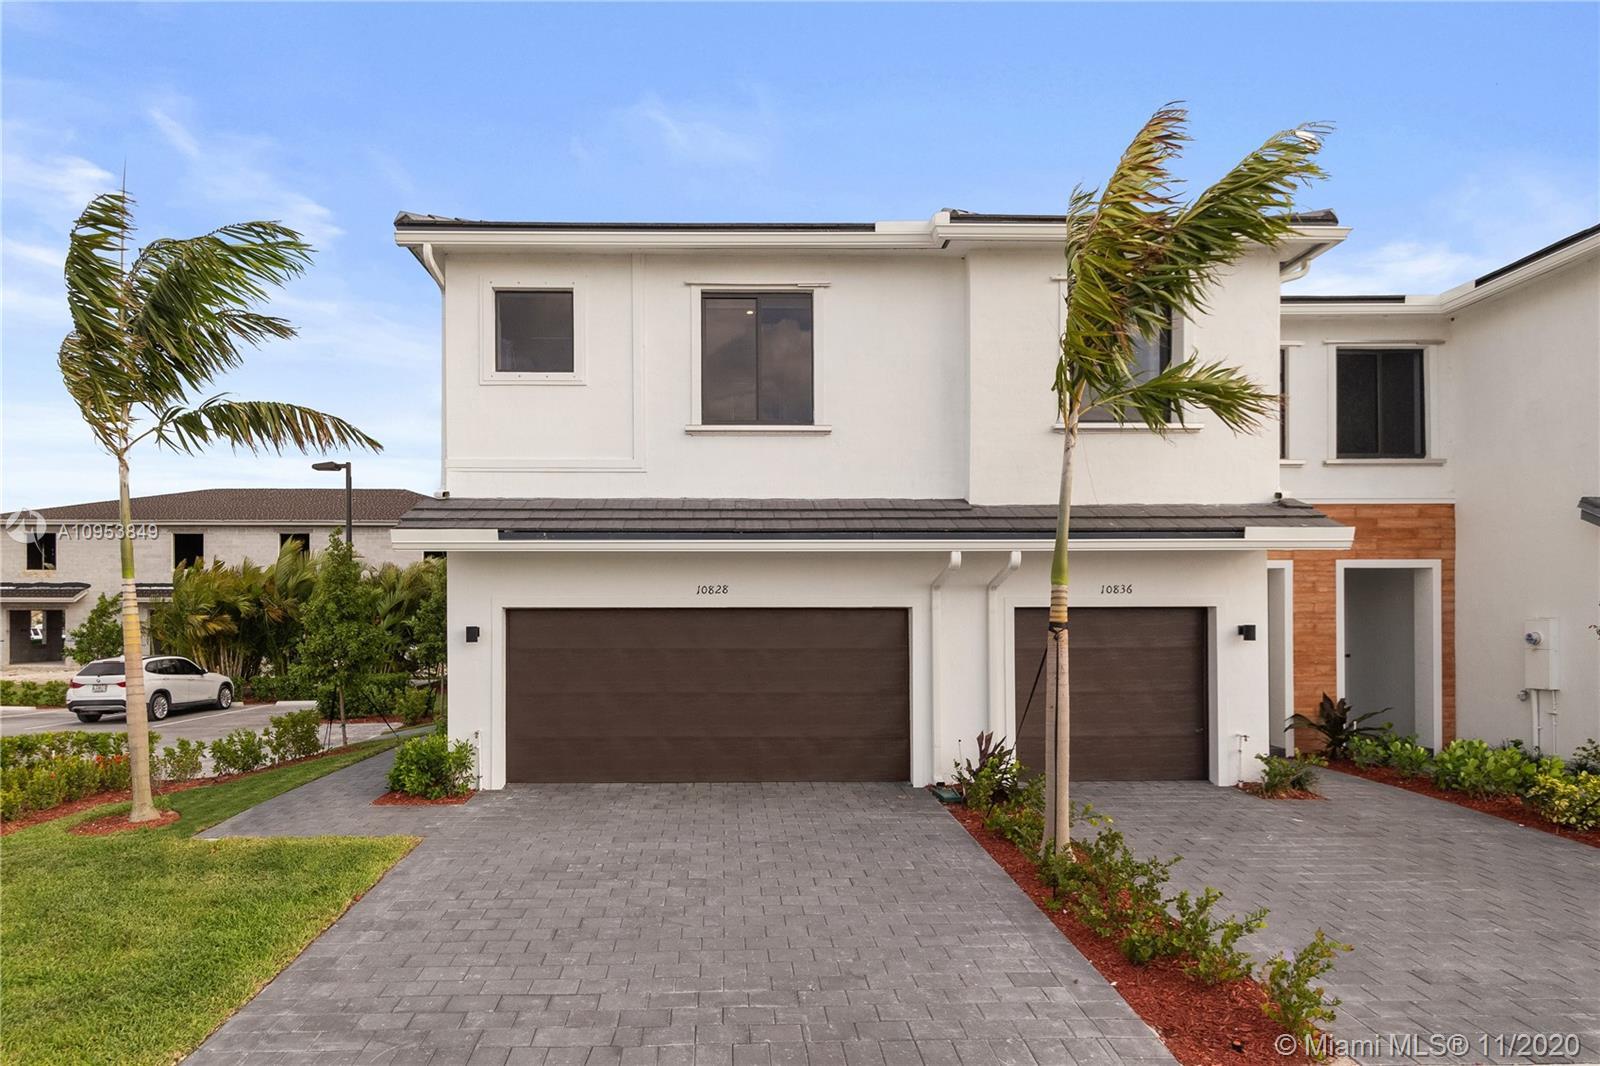 10953 SW 232 TER Property Photo - Miami, FL real estate listing